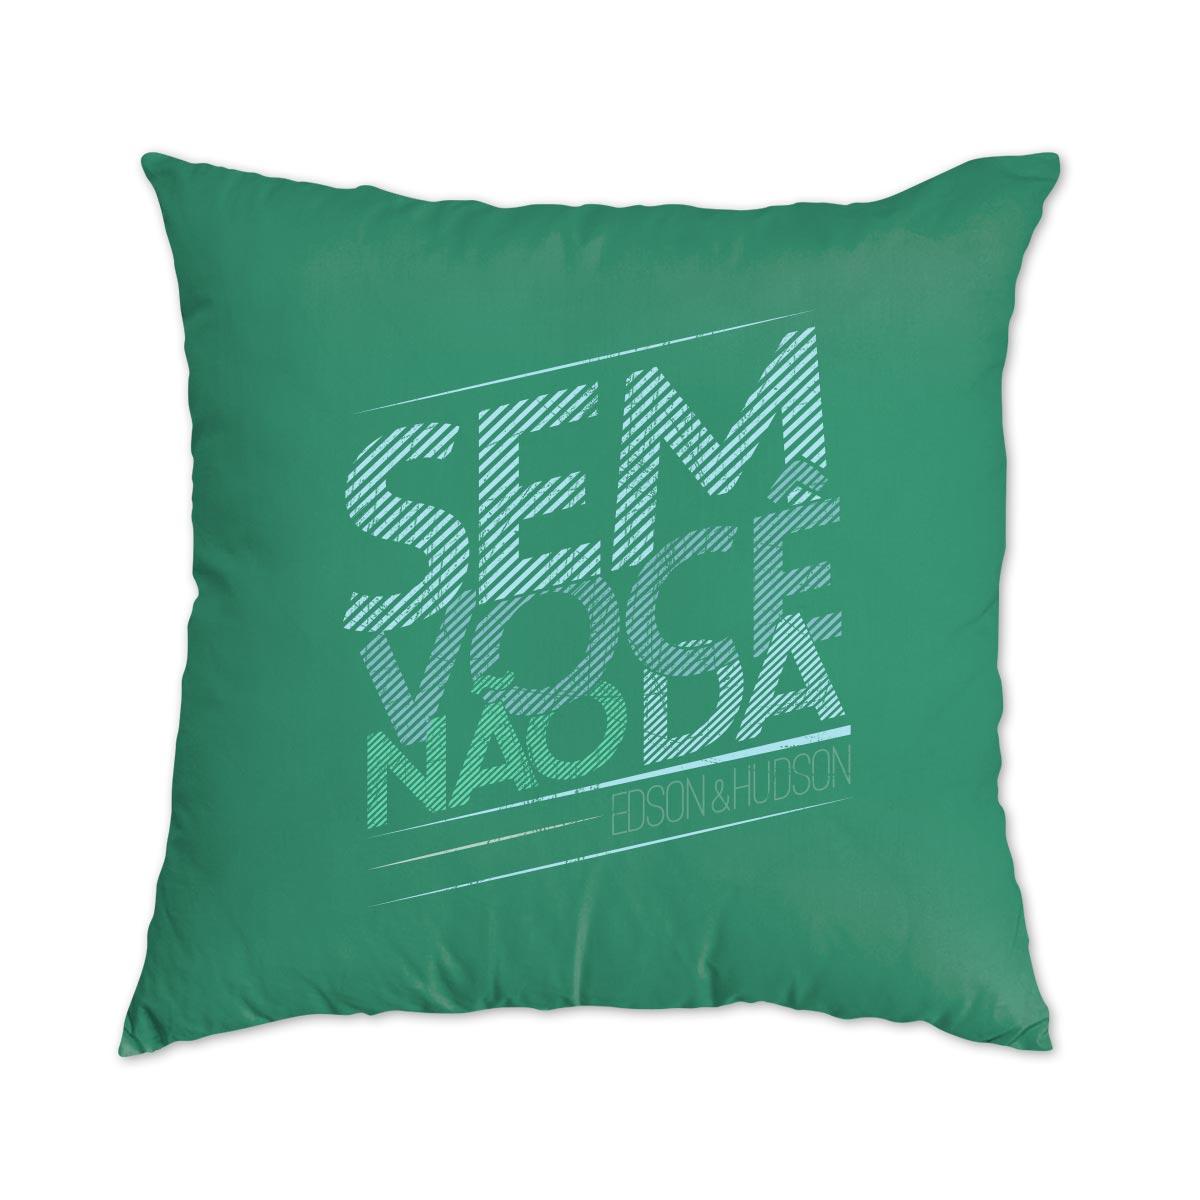 Almofada Edson & Hudson Sem Voc� N�o D�